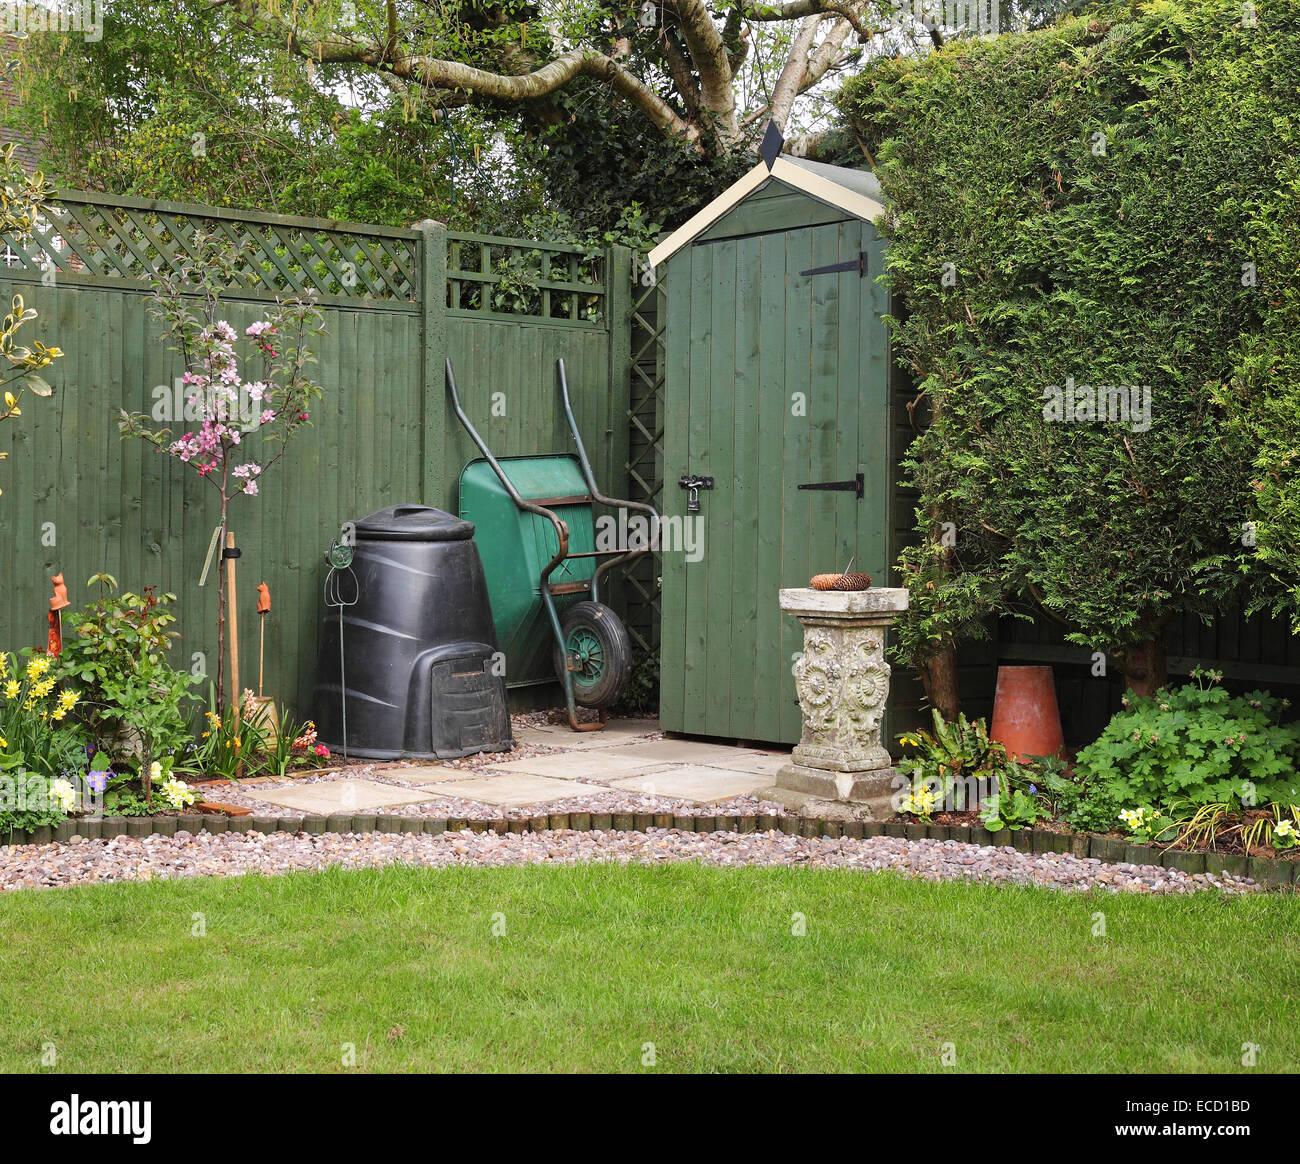 English back garden with compost bin and wheelbarrow - Stock Image